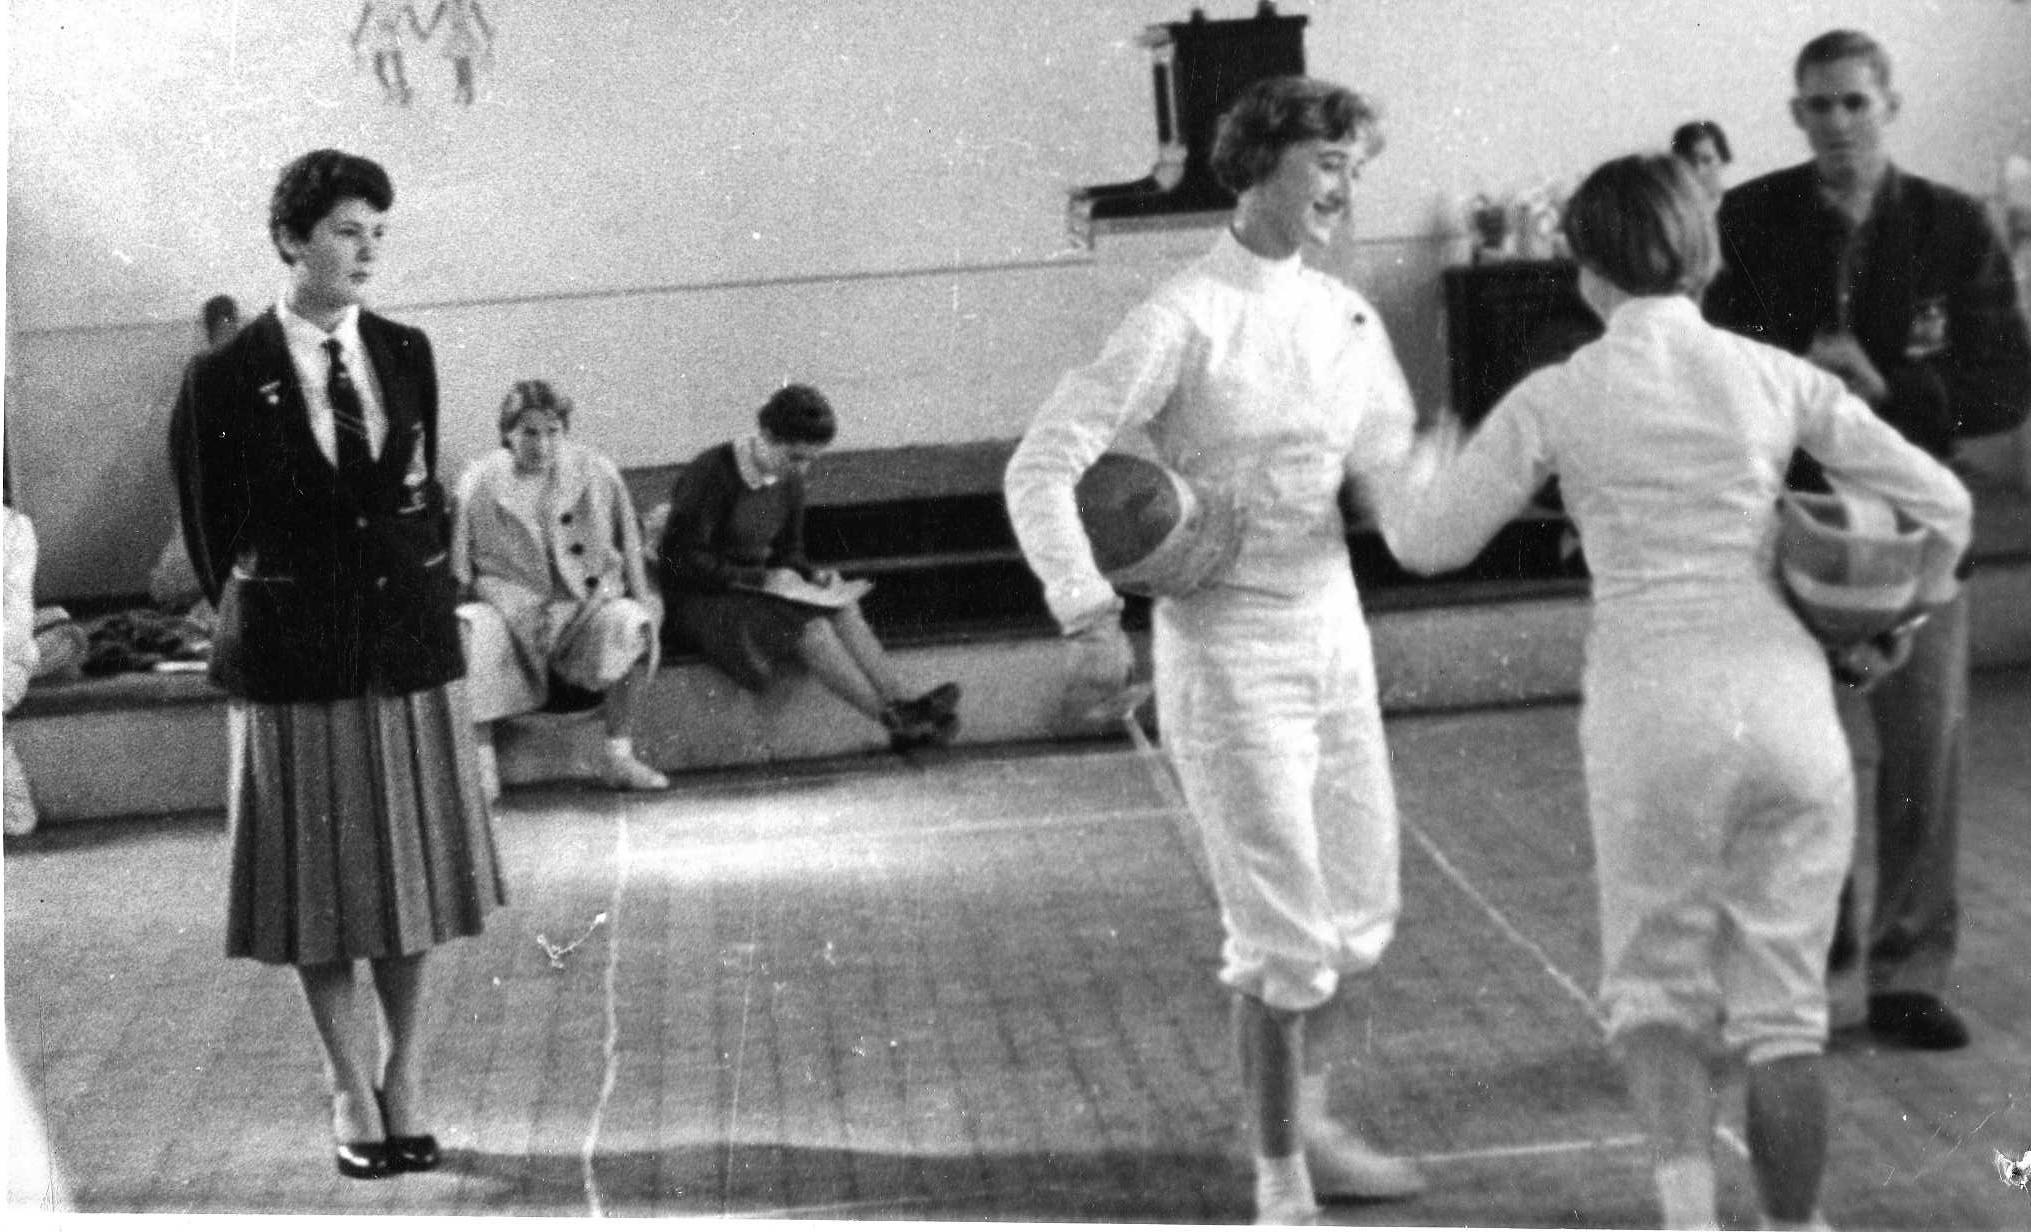 Joanna Winter vs. Jill Glanville, Judges Denise O'Brien (Left), Michael Sichel (Right)